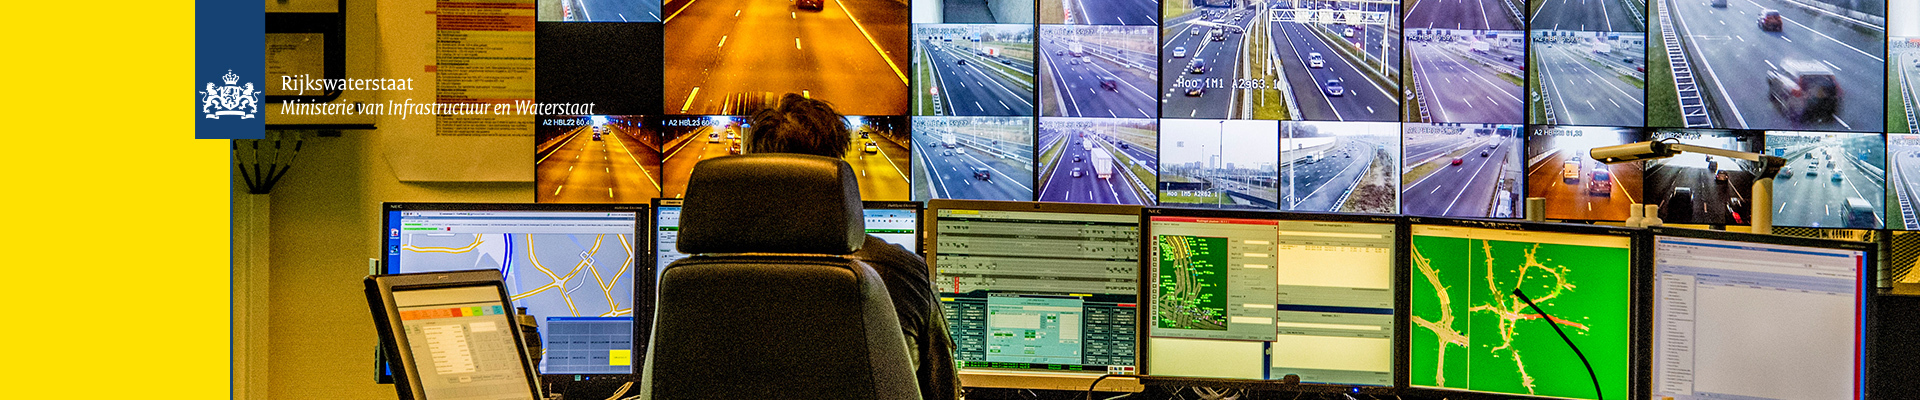 Meet & Greet wegverkeersleiders 27 november